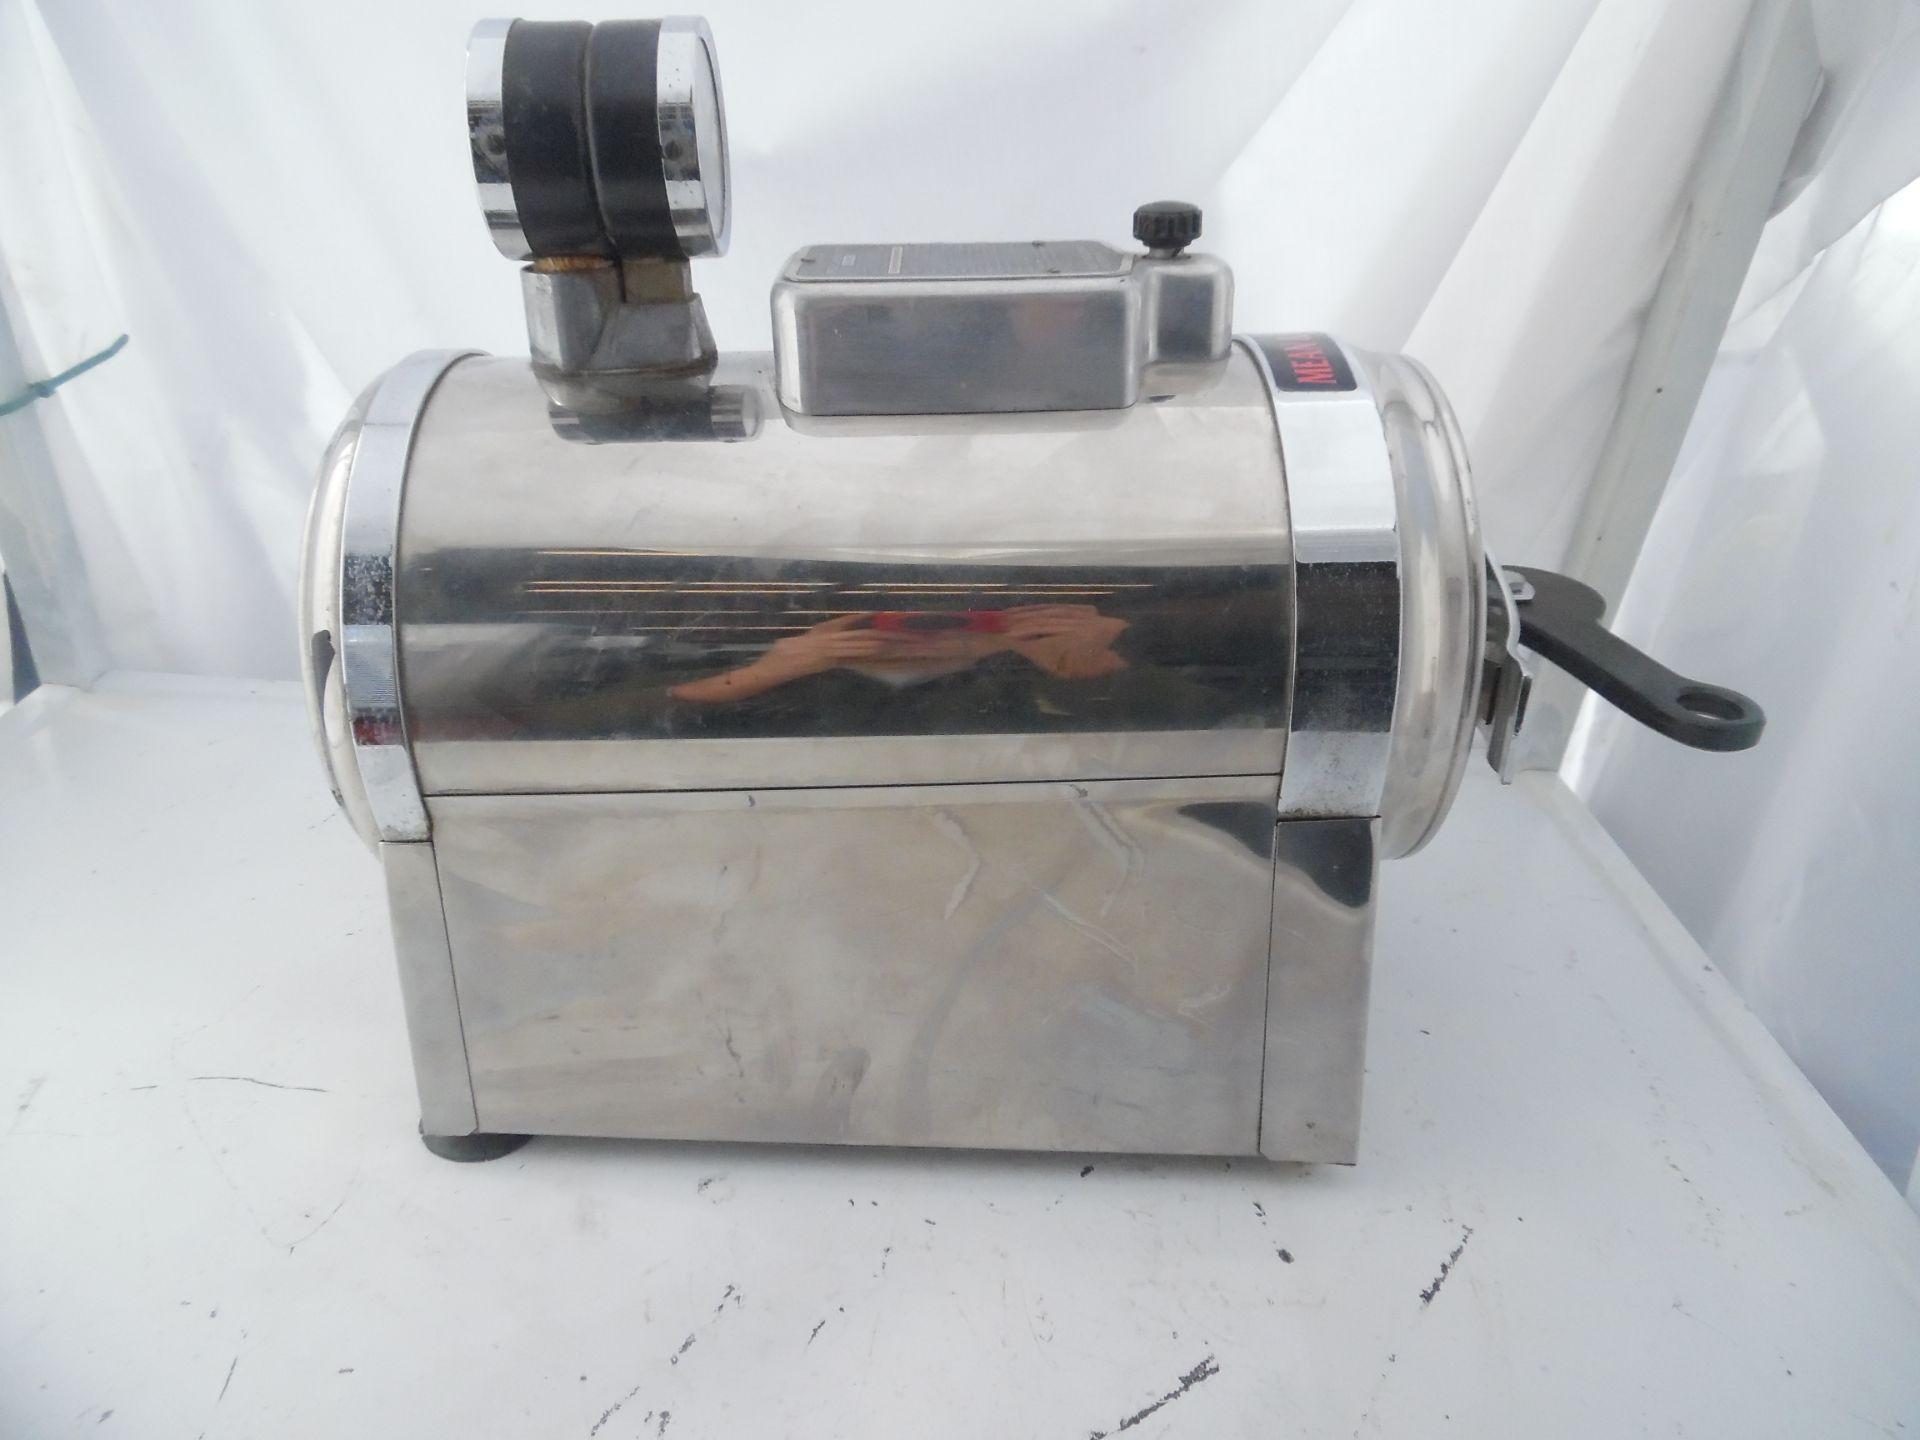 Castle Model 777 Autoclave Sterilizer.110V 10 amps. - Image 2 of 4